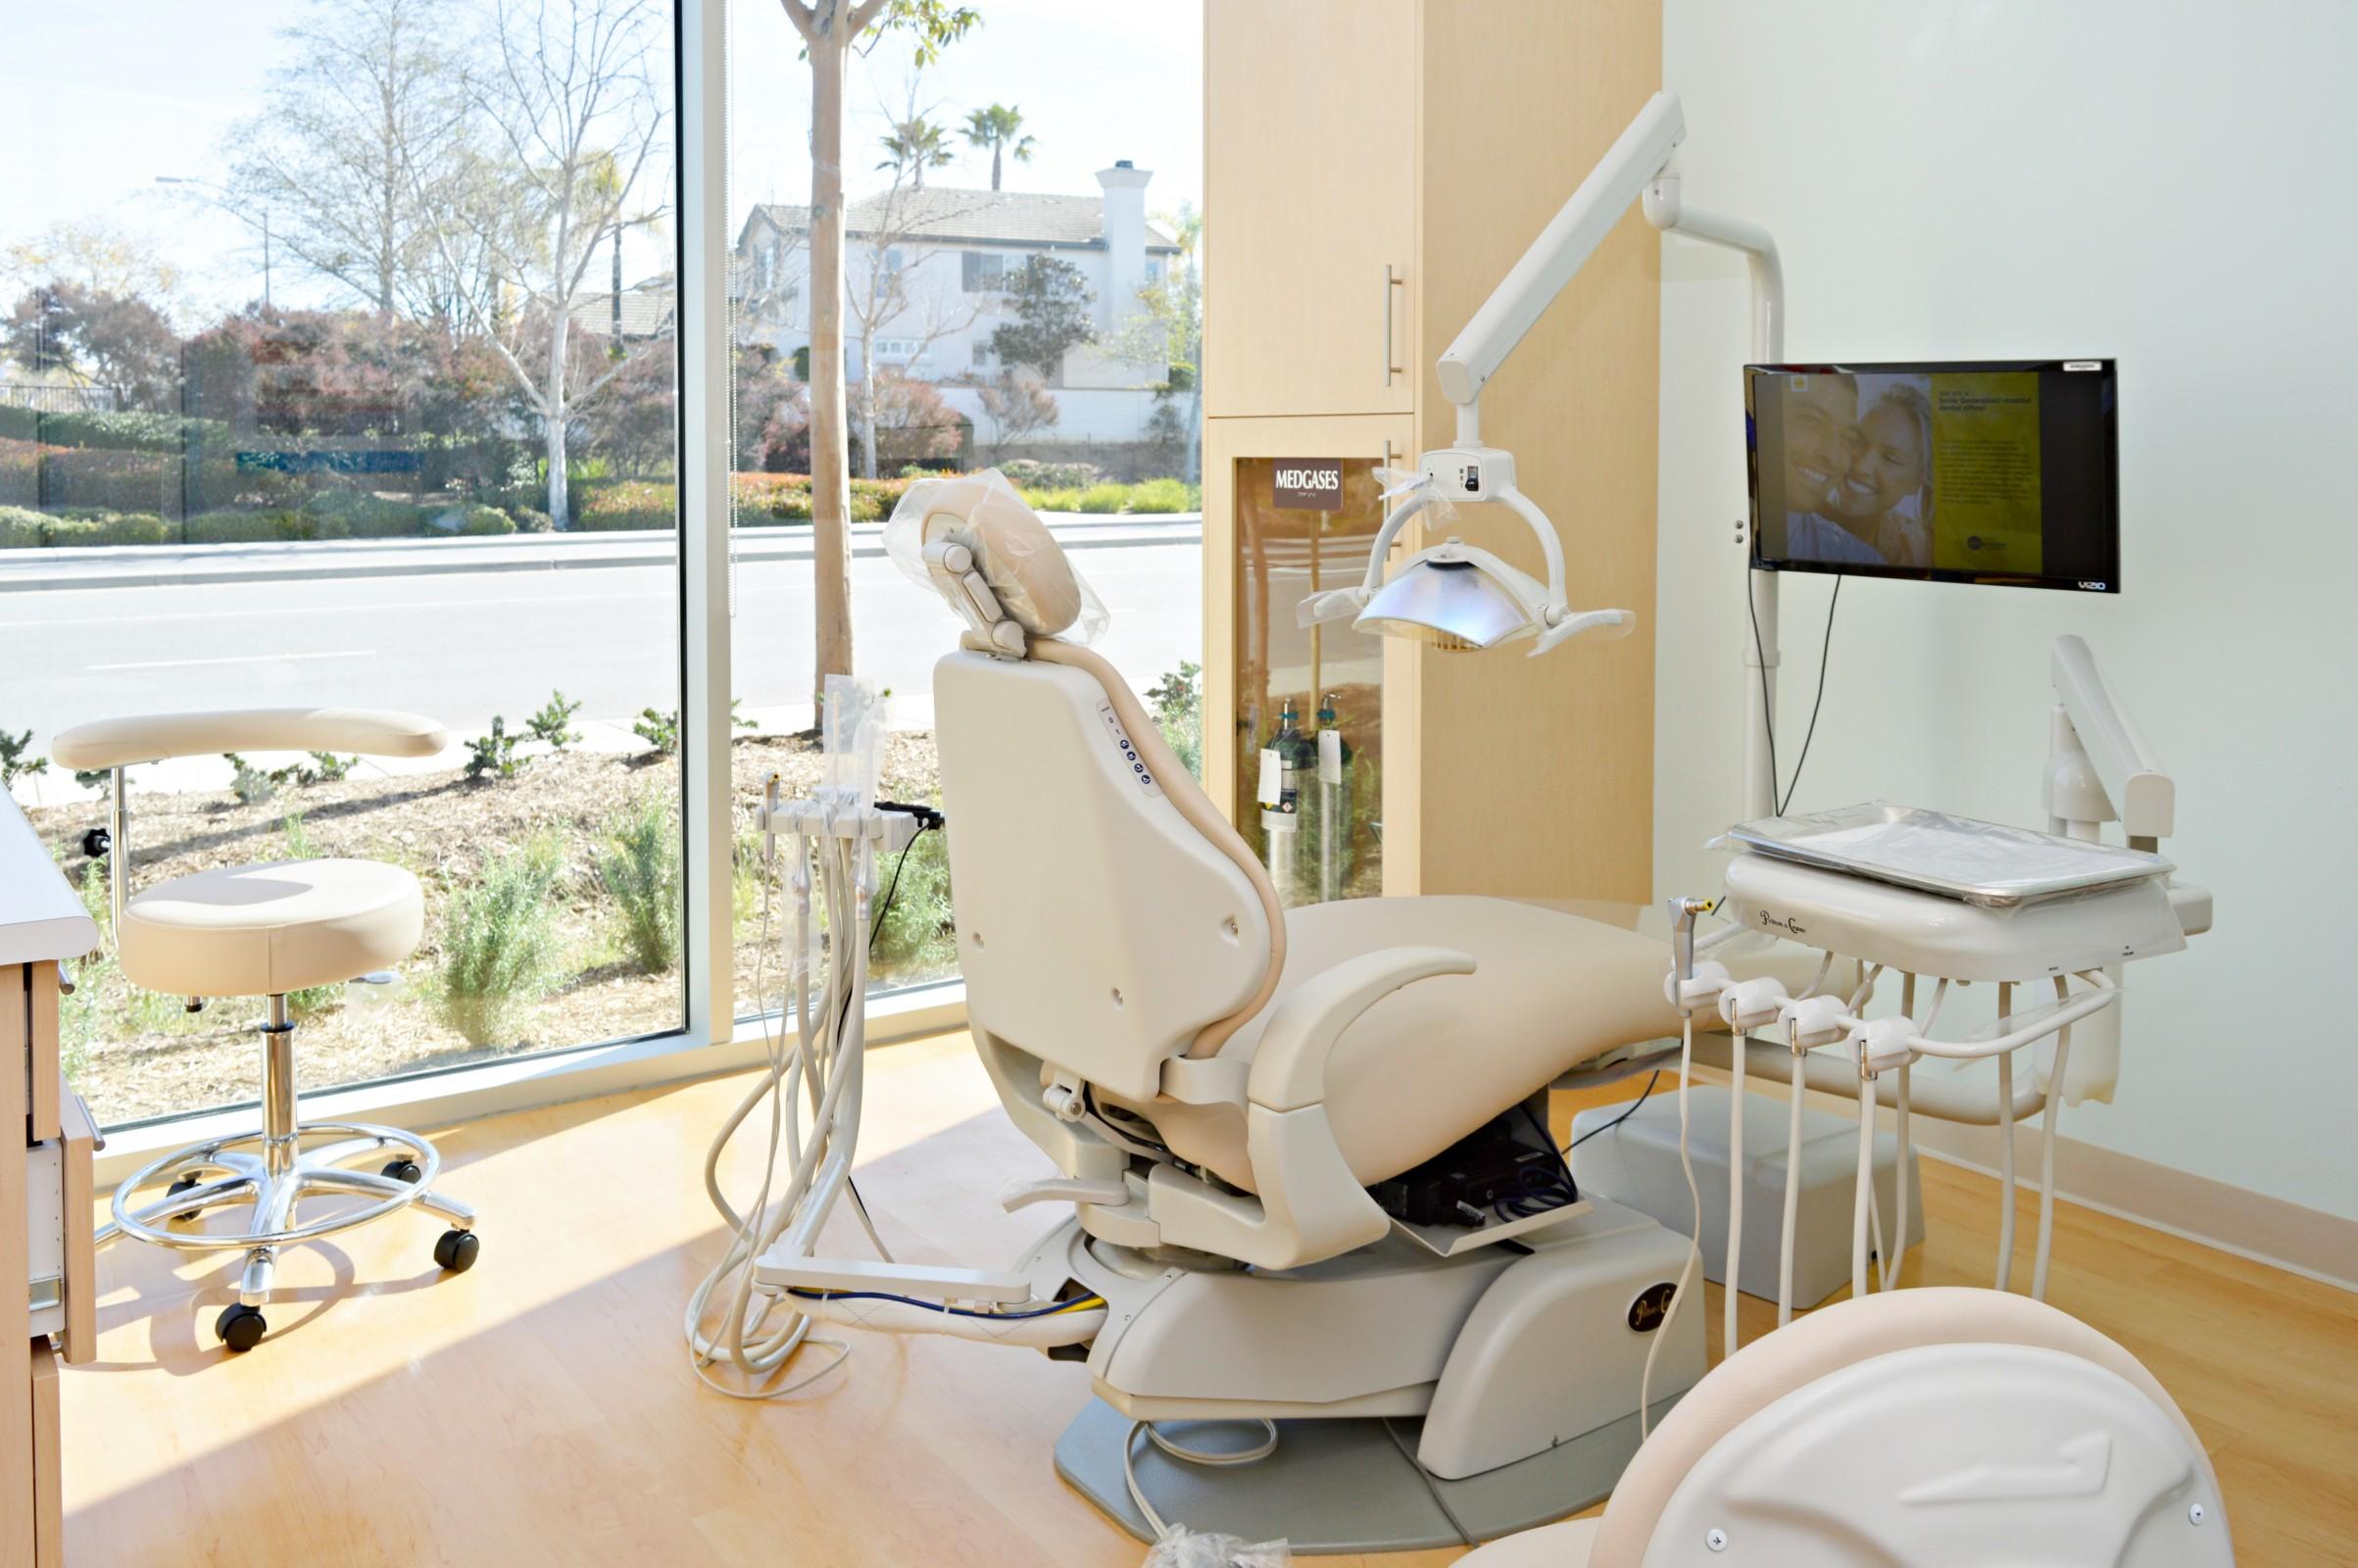 Carmel Valley Dentist Office and Orthodontics image 5